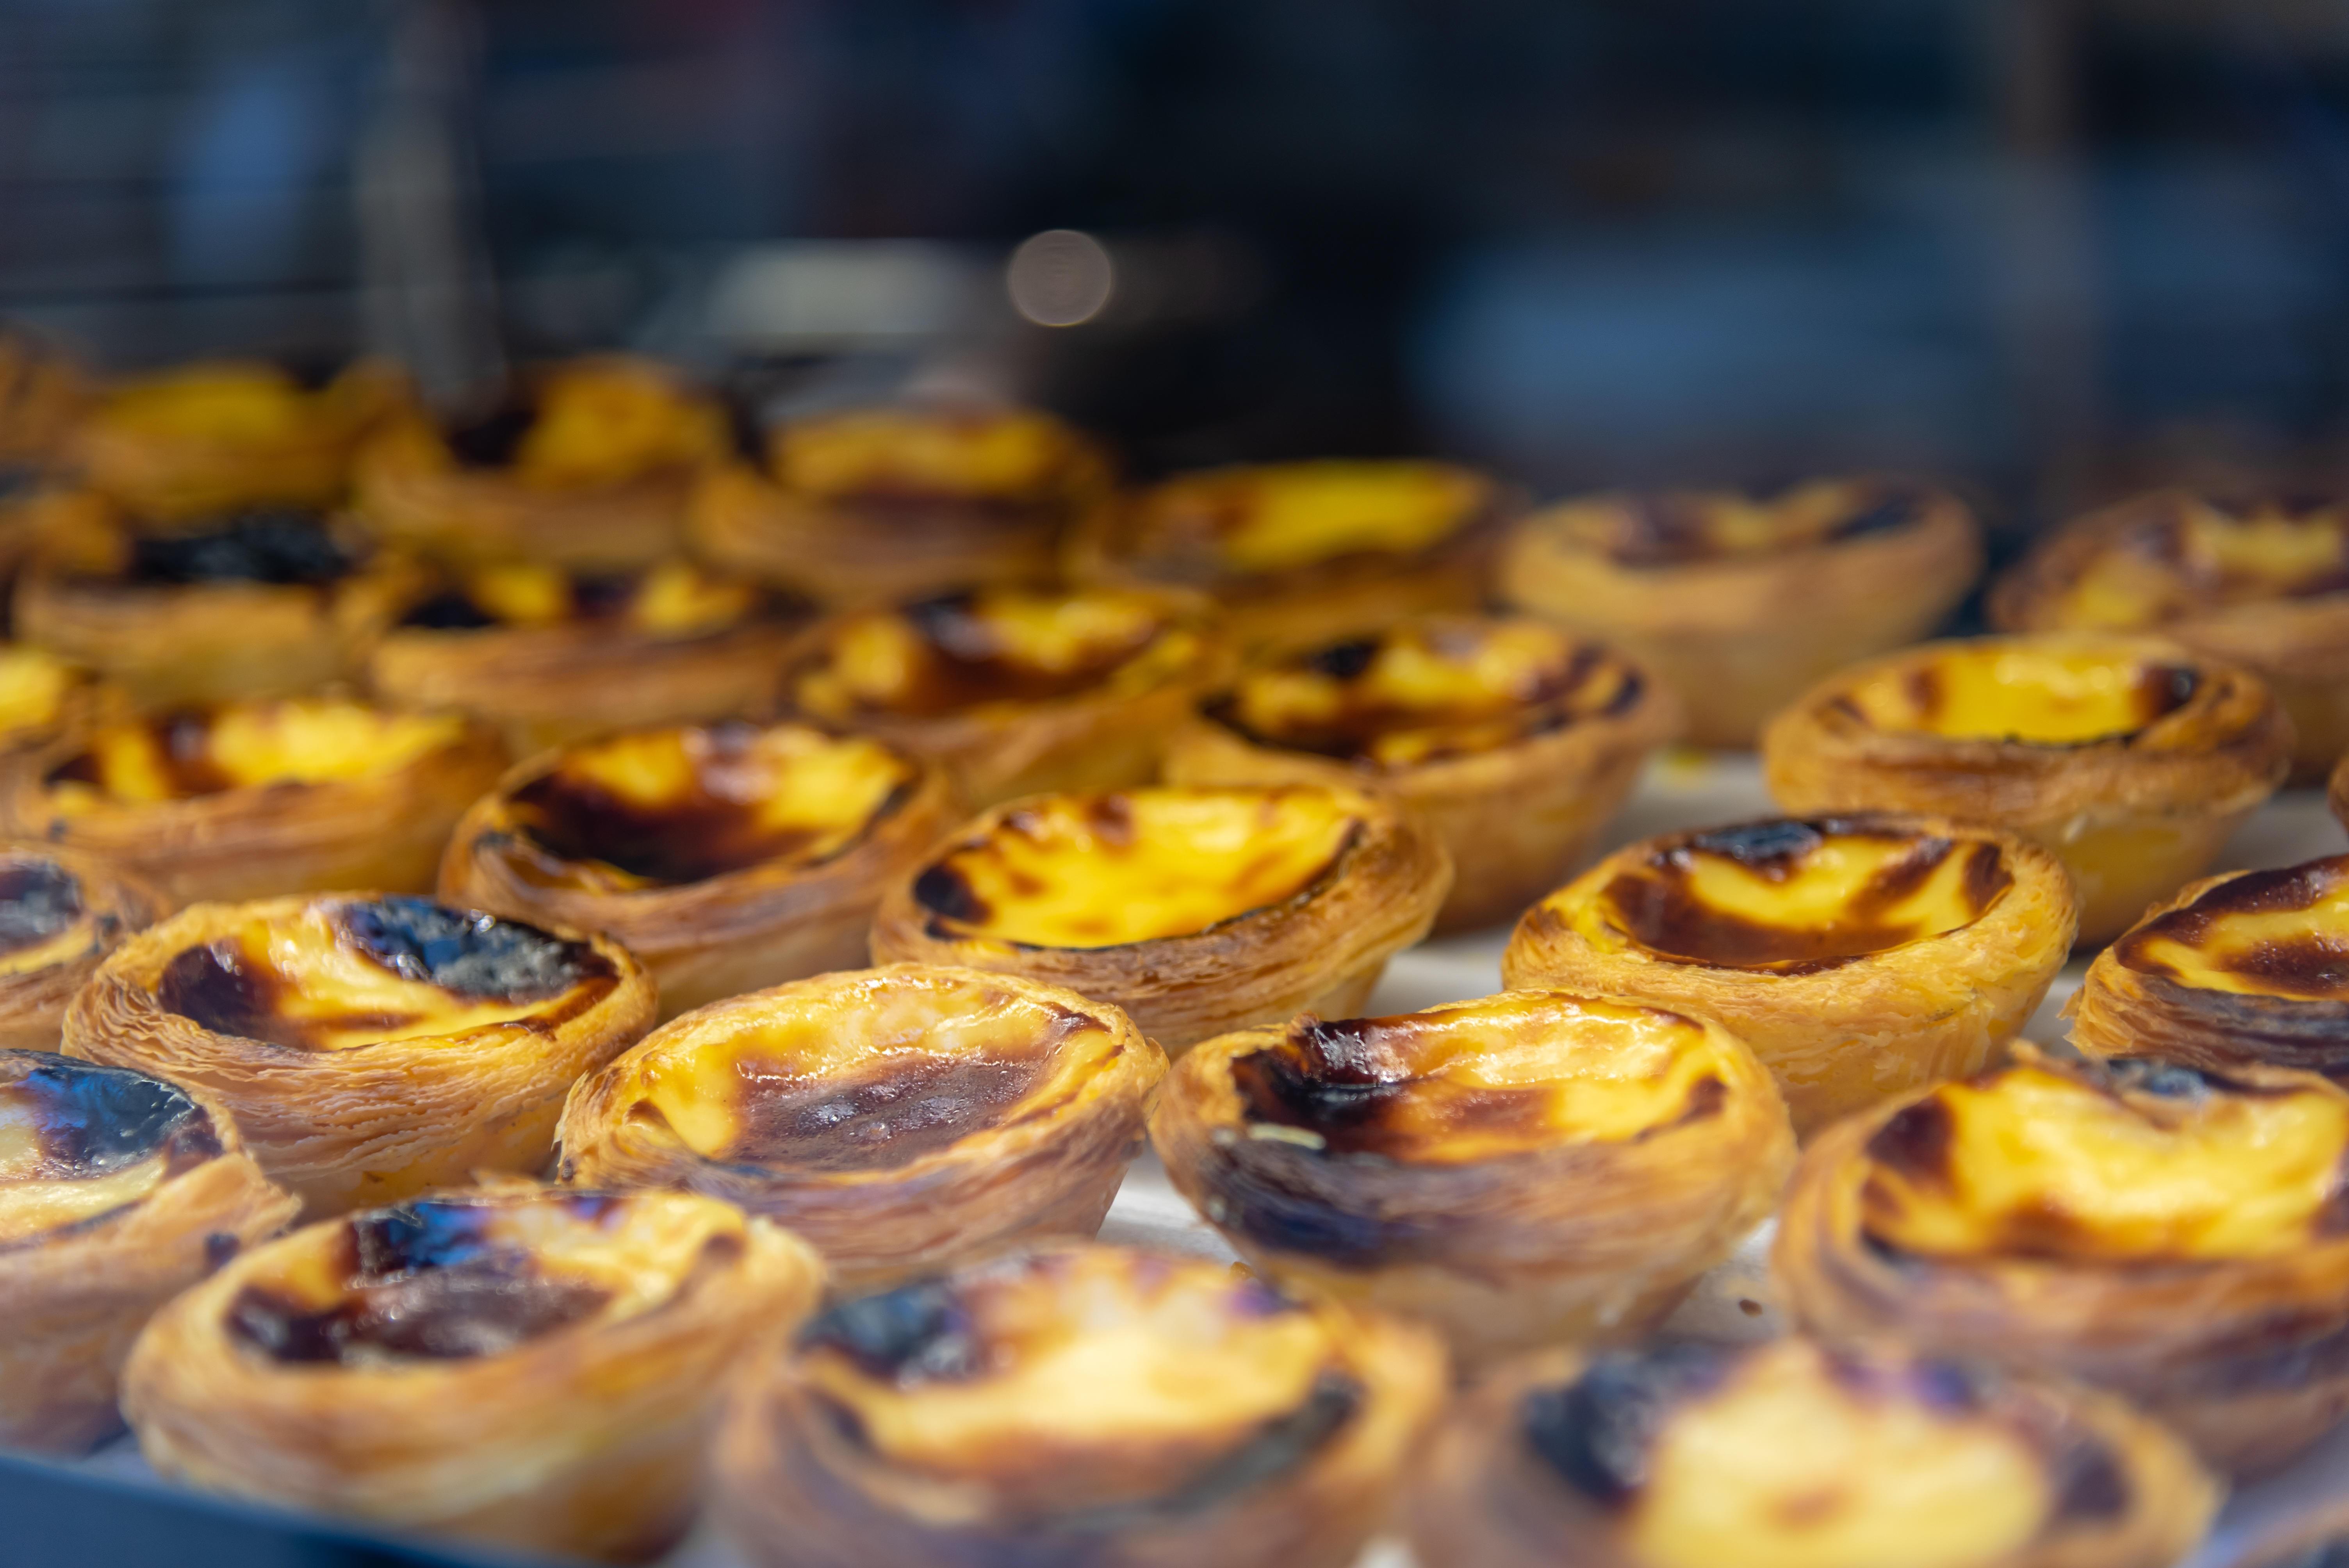 Pasteis de nata, the famous Portuguese custard tarts